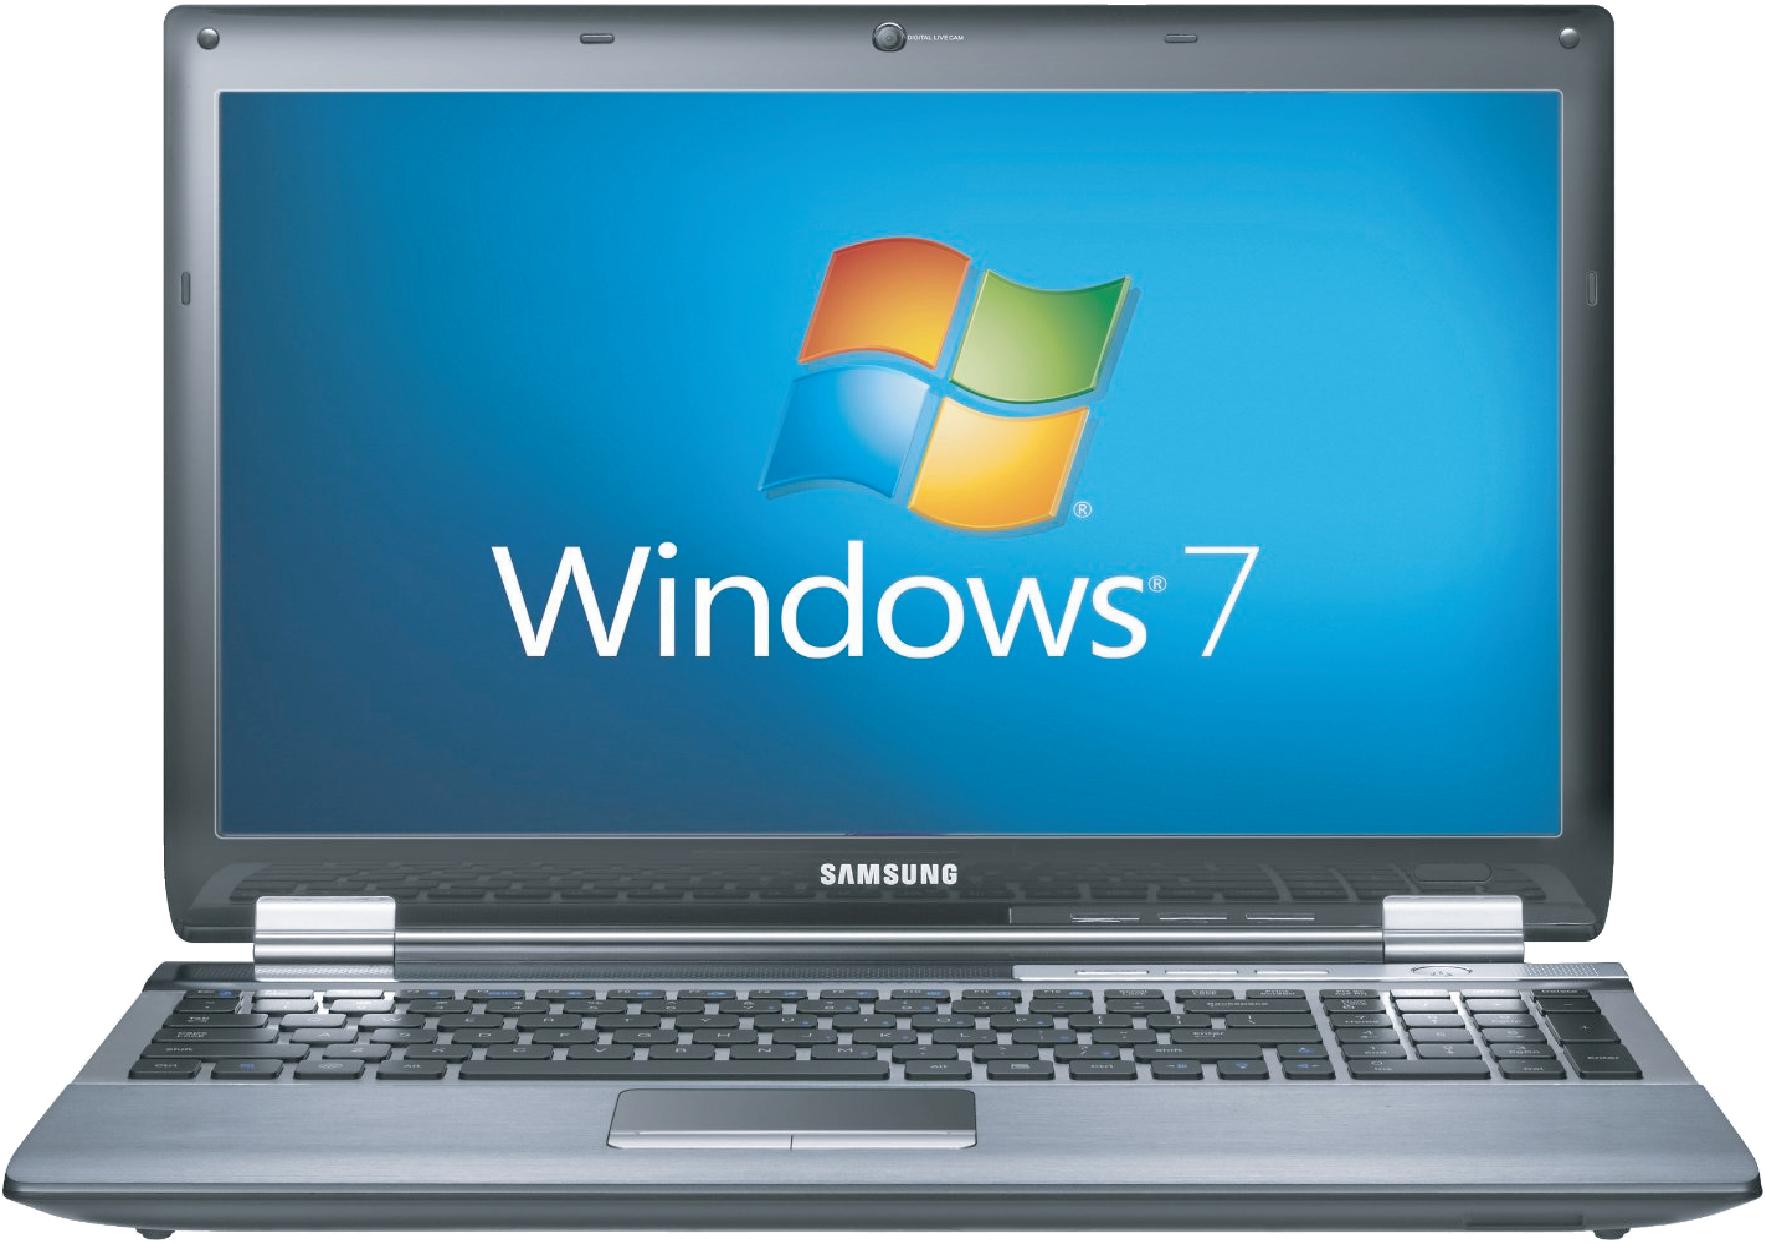 Laptop Png image #6777 - Lapt